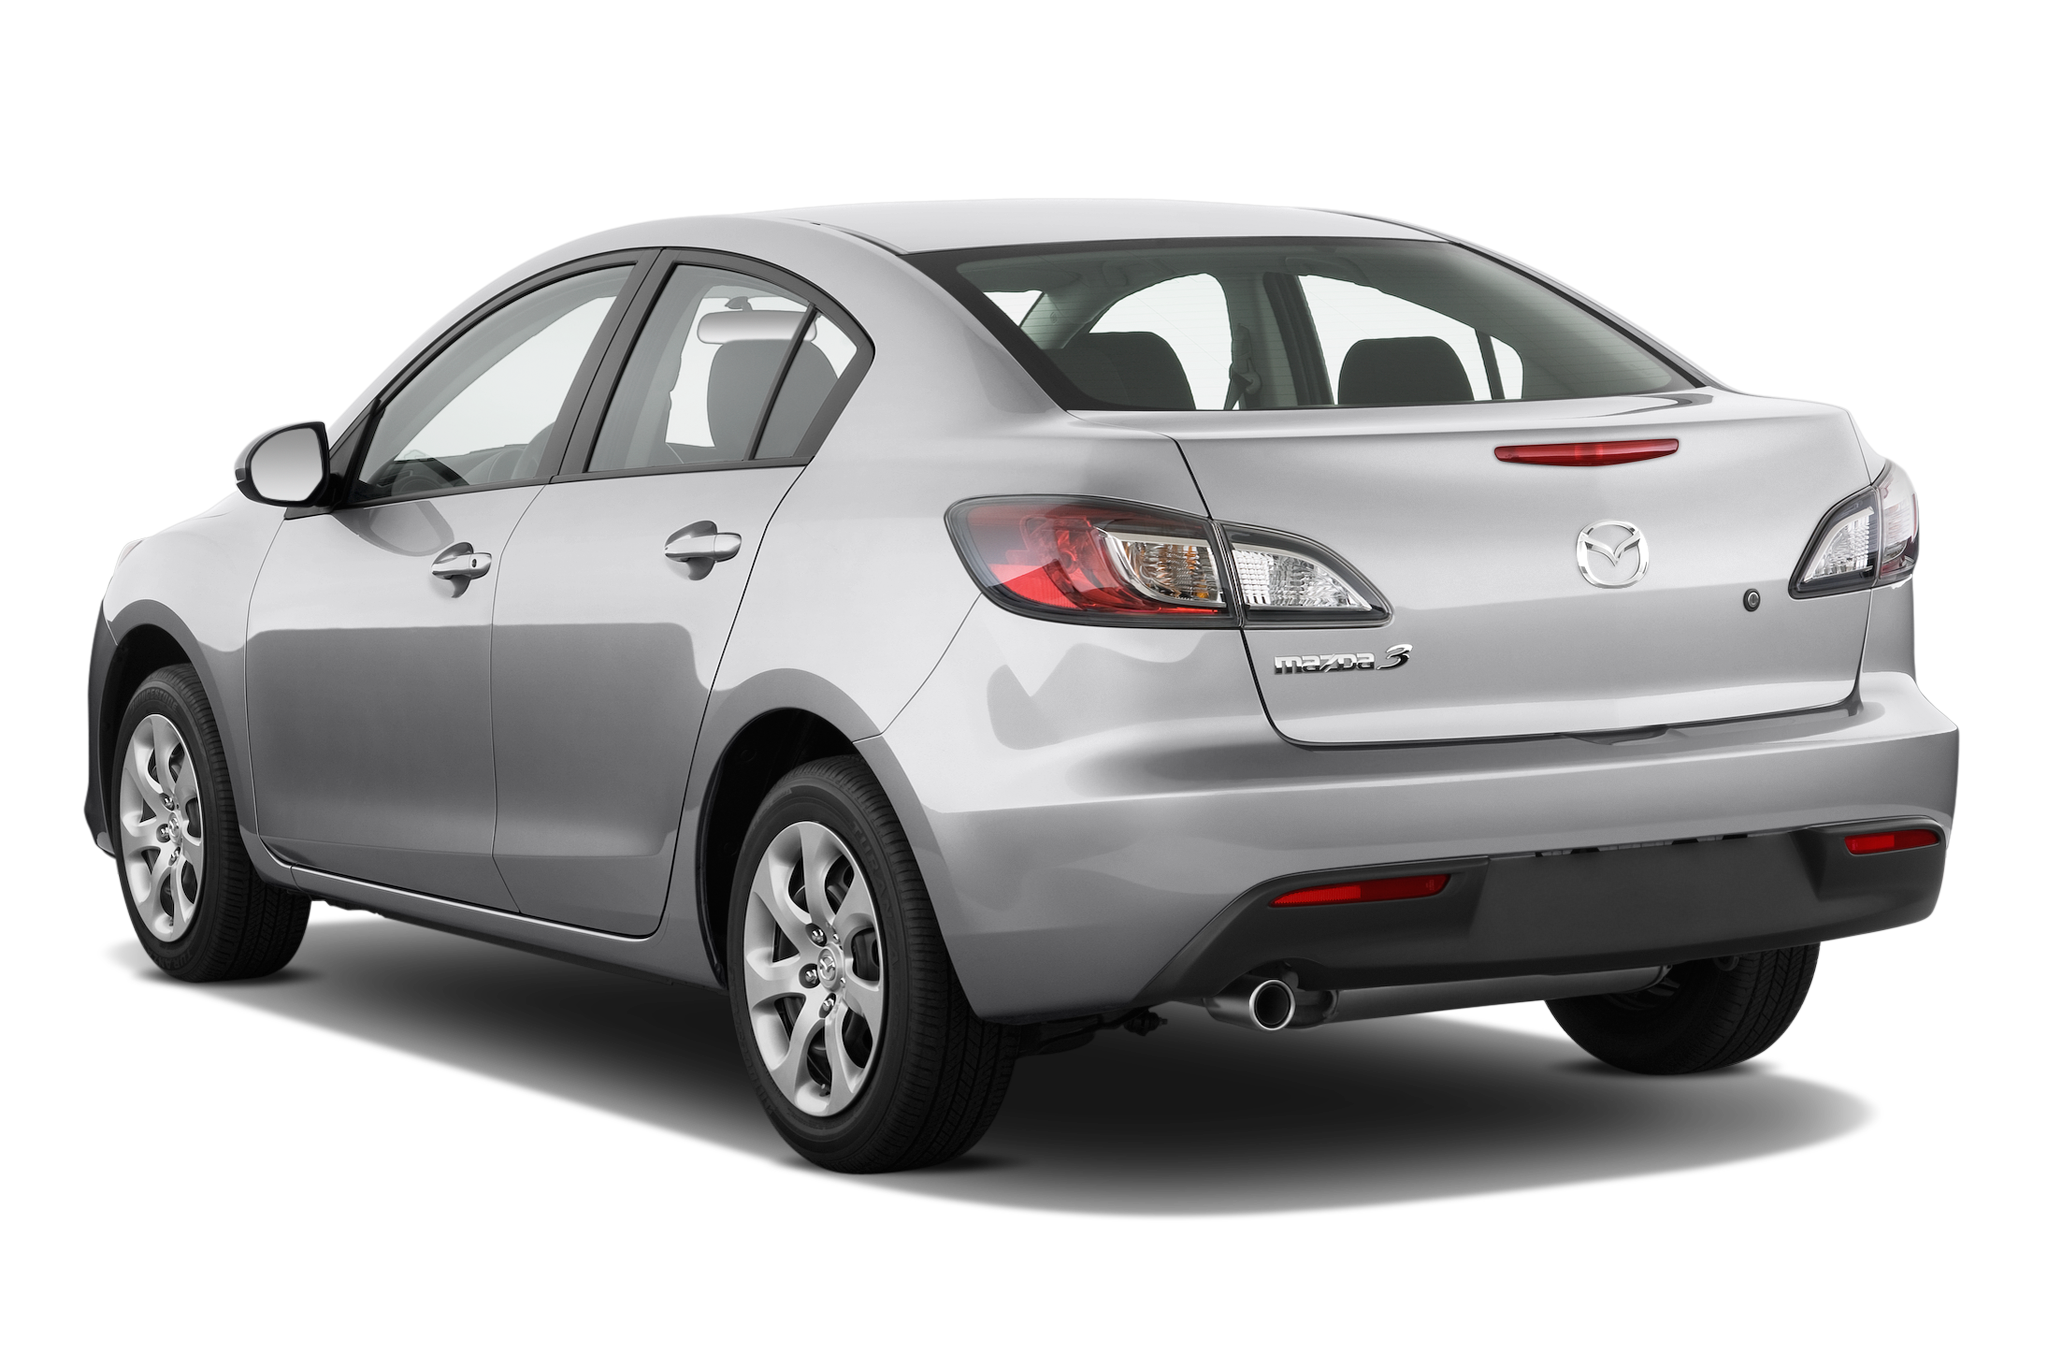 Mazda Speed 3 >> 2010 Mazda 3 vs MazdaSpeed 3 - Mazda Sports Hatchback Review - Automobile Magazine